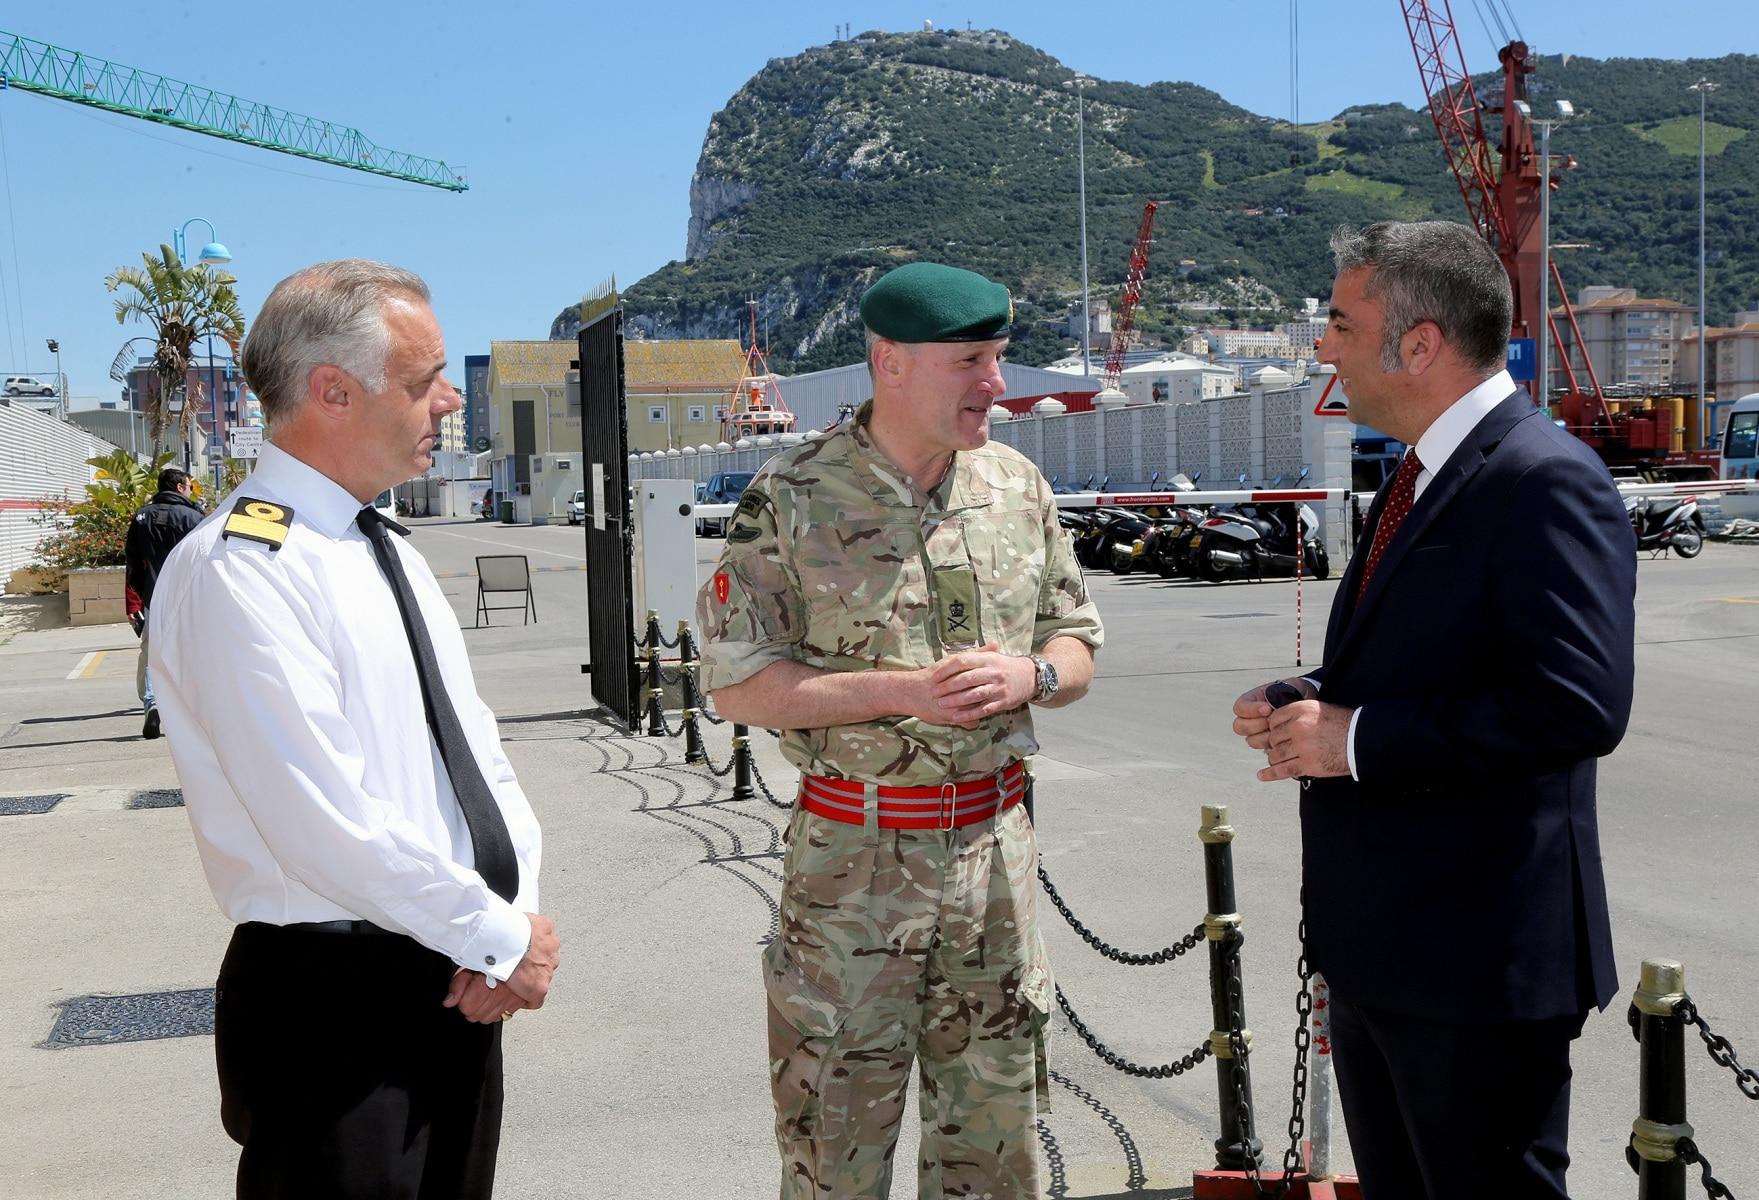 visita-oficial-del-gobernador-al-puerto-de-gibraltar_25549742484_o